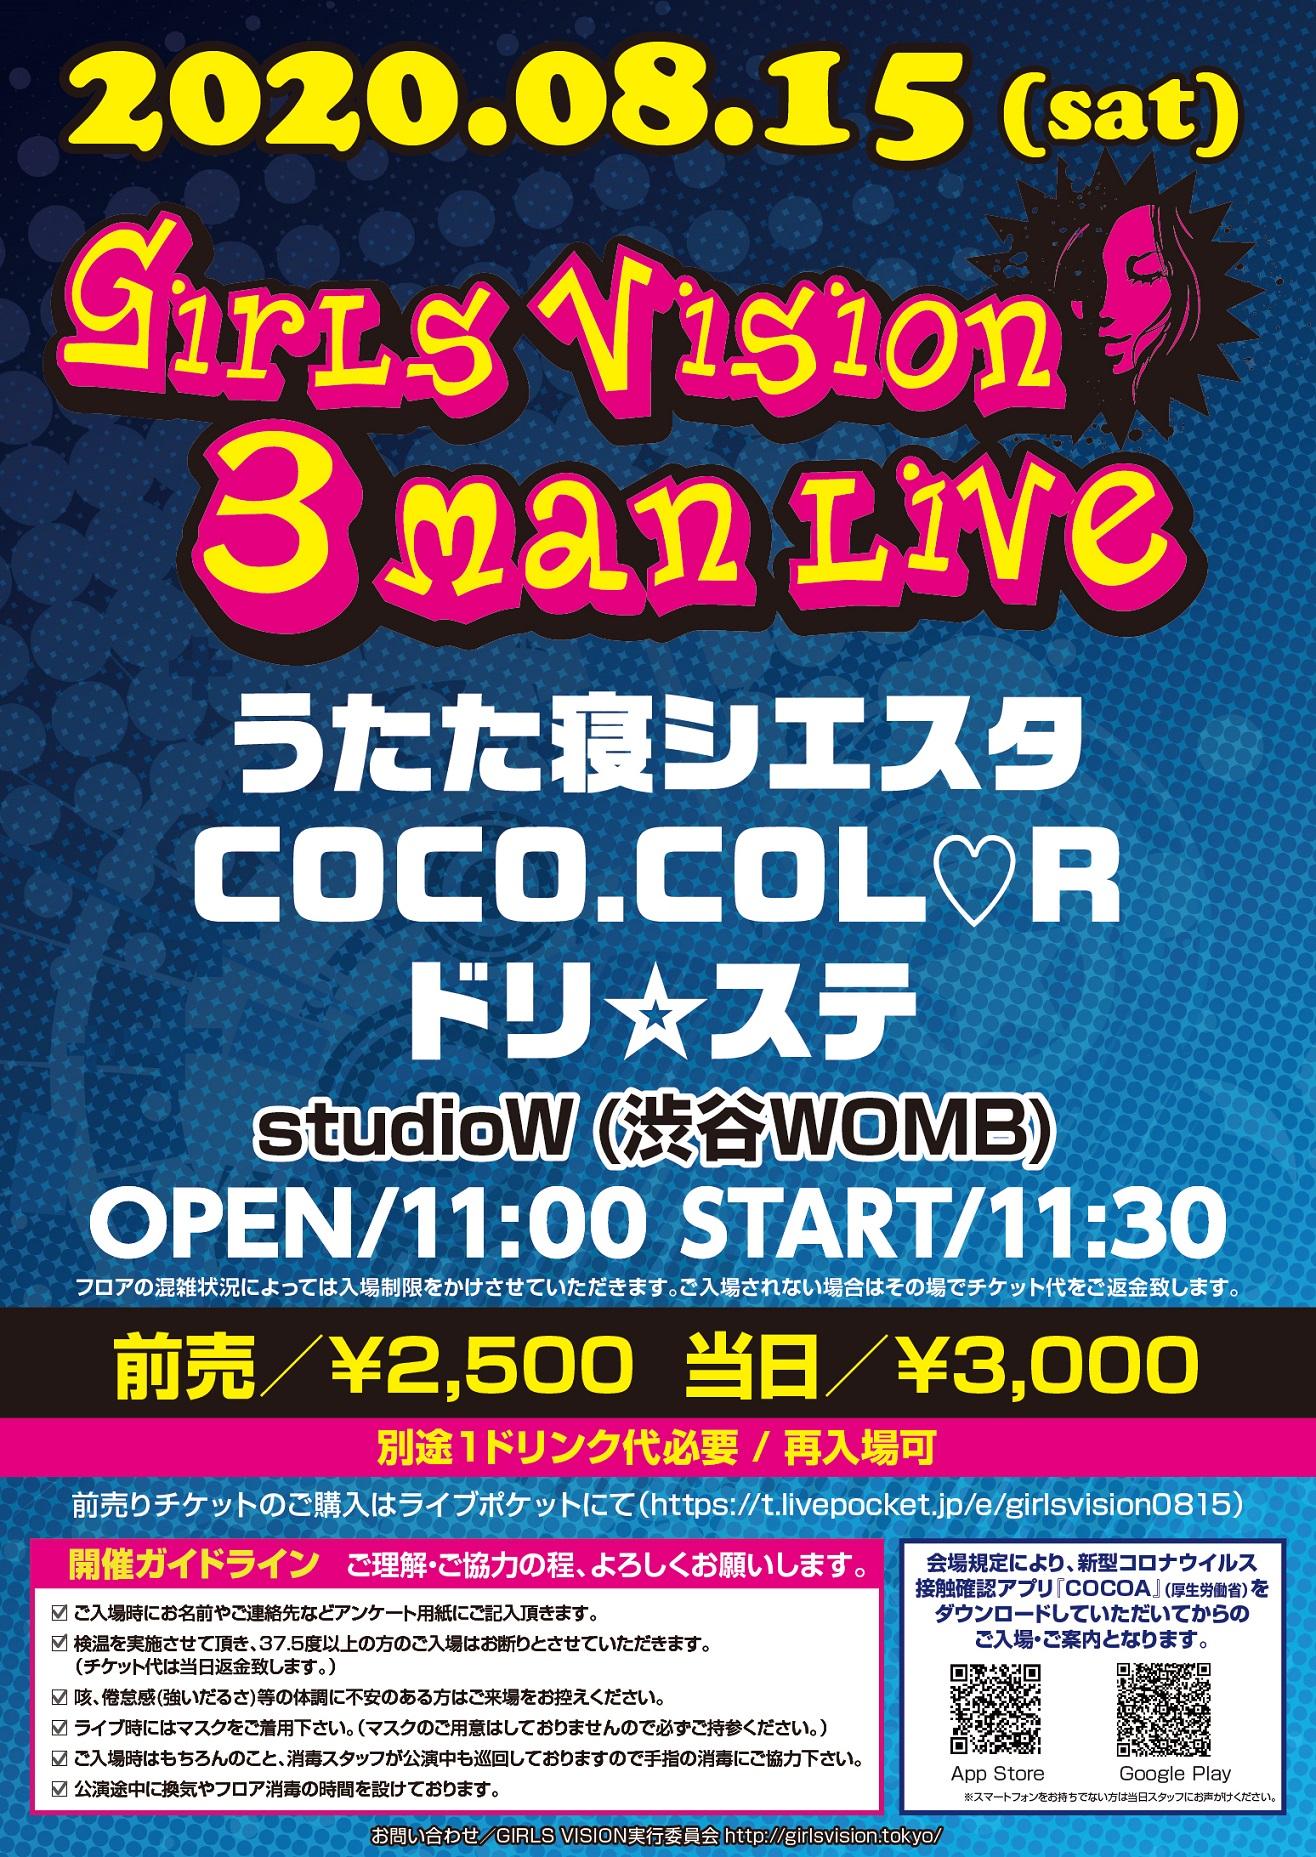 GIRLS VISION -3 MAN LIVE-